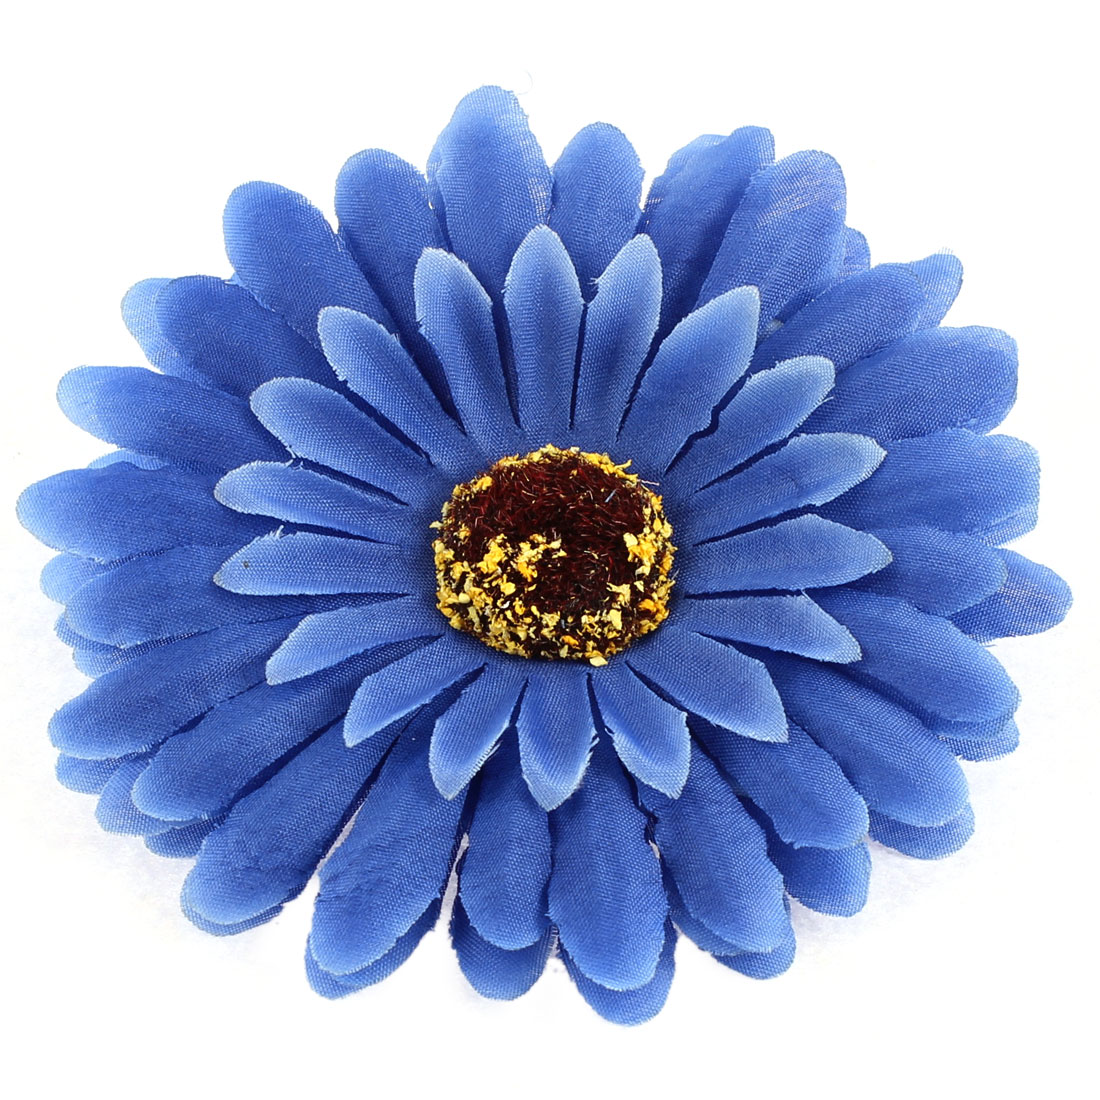 "Party Wedding Bride Artificial Daisy Flower Headwear Accessary 4"" Dia Blue"